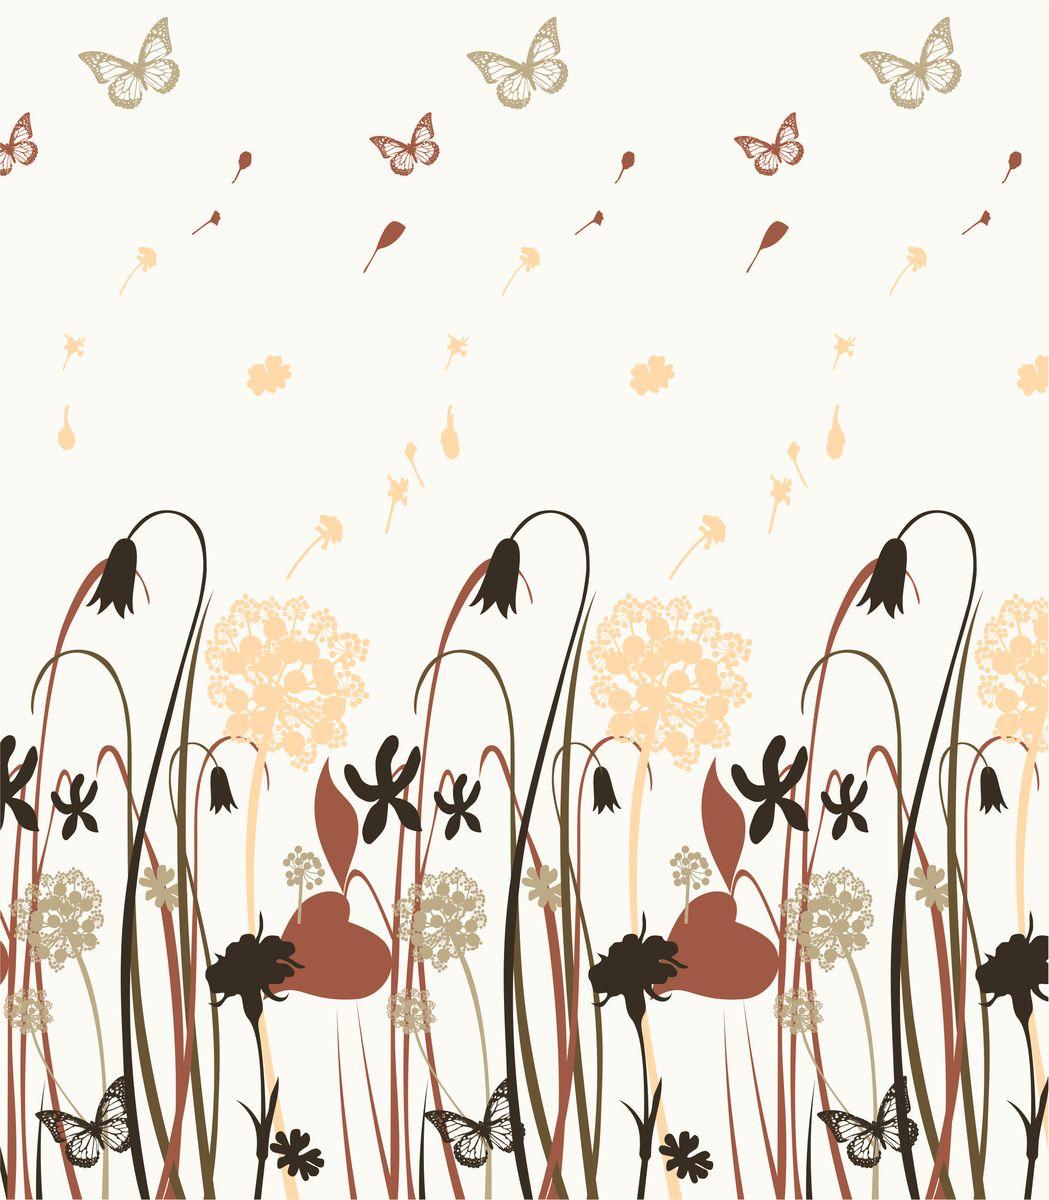 Фото - Штора для ванной комнаты Vanstore Поле, цвет: белый, бежевый, 180 х 180 см штора для ванной комнаты tatkraft stone garden 180 х 180 см